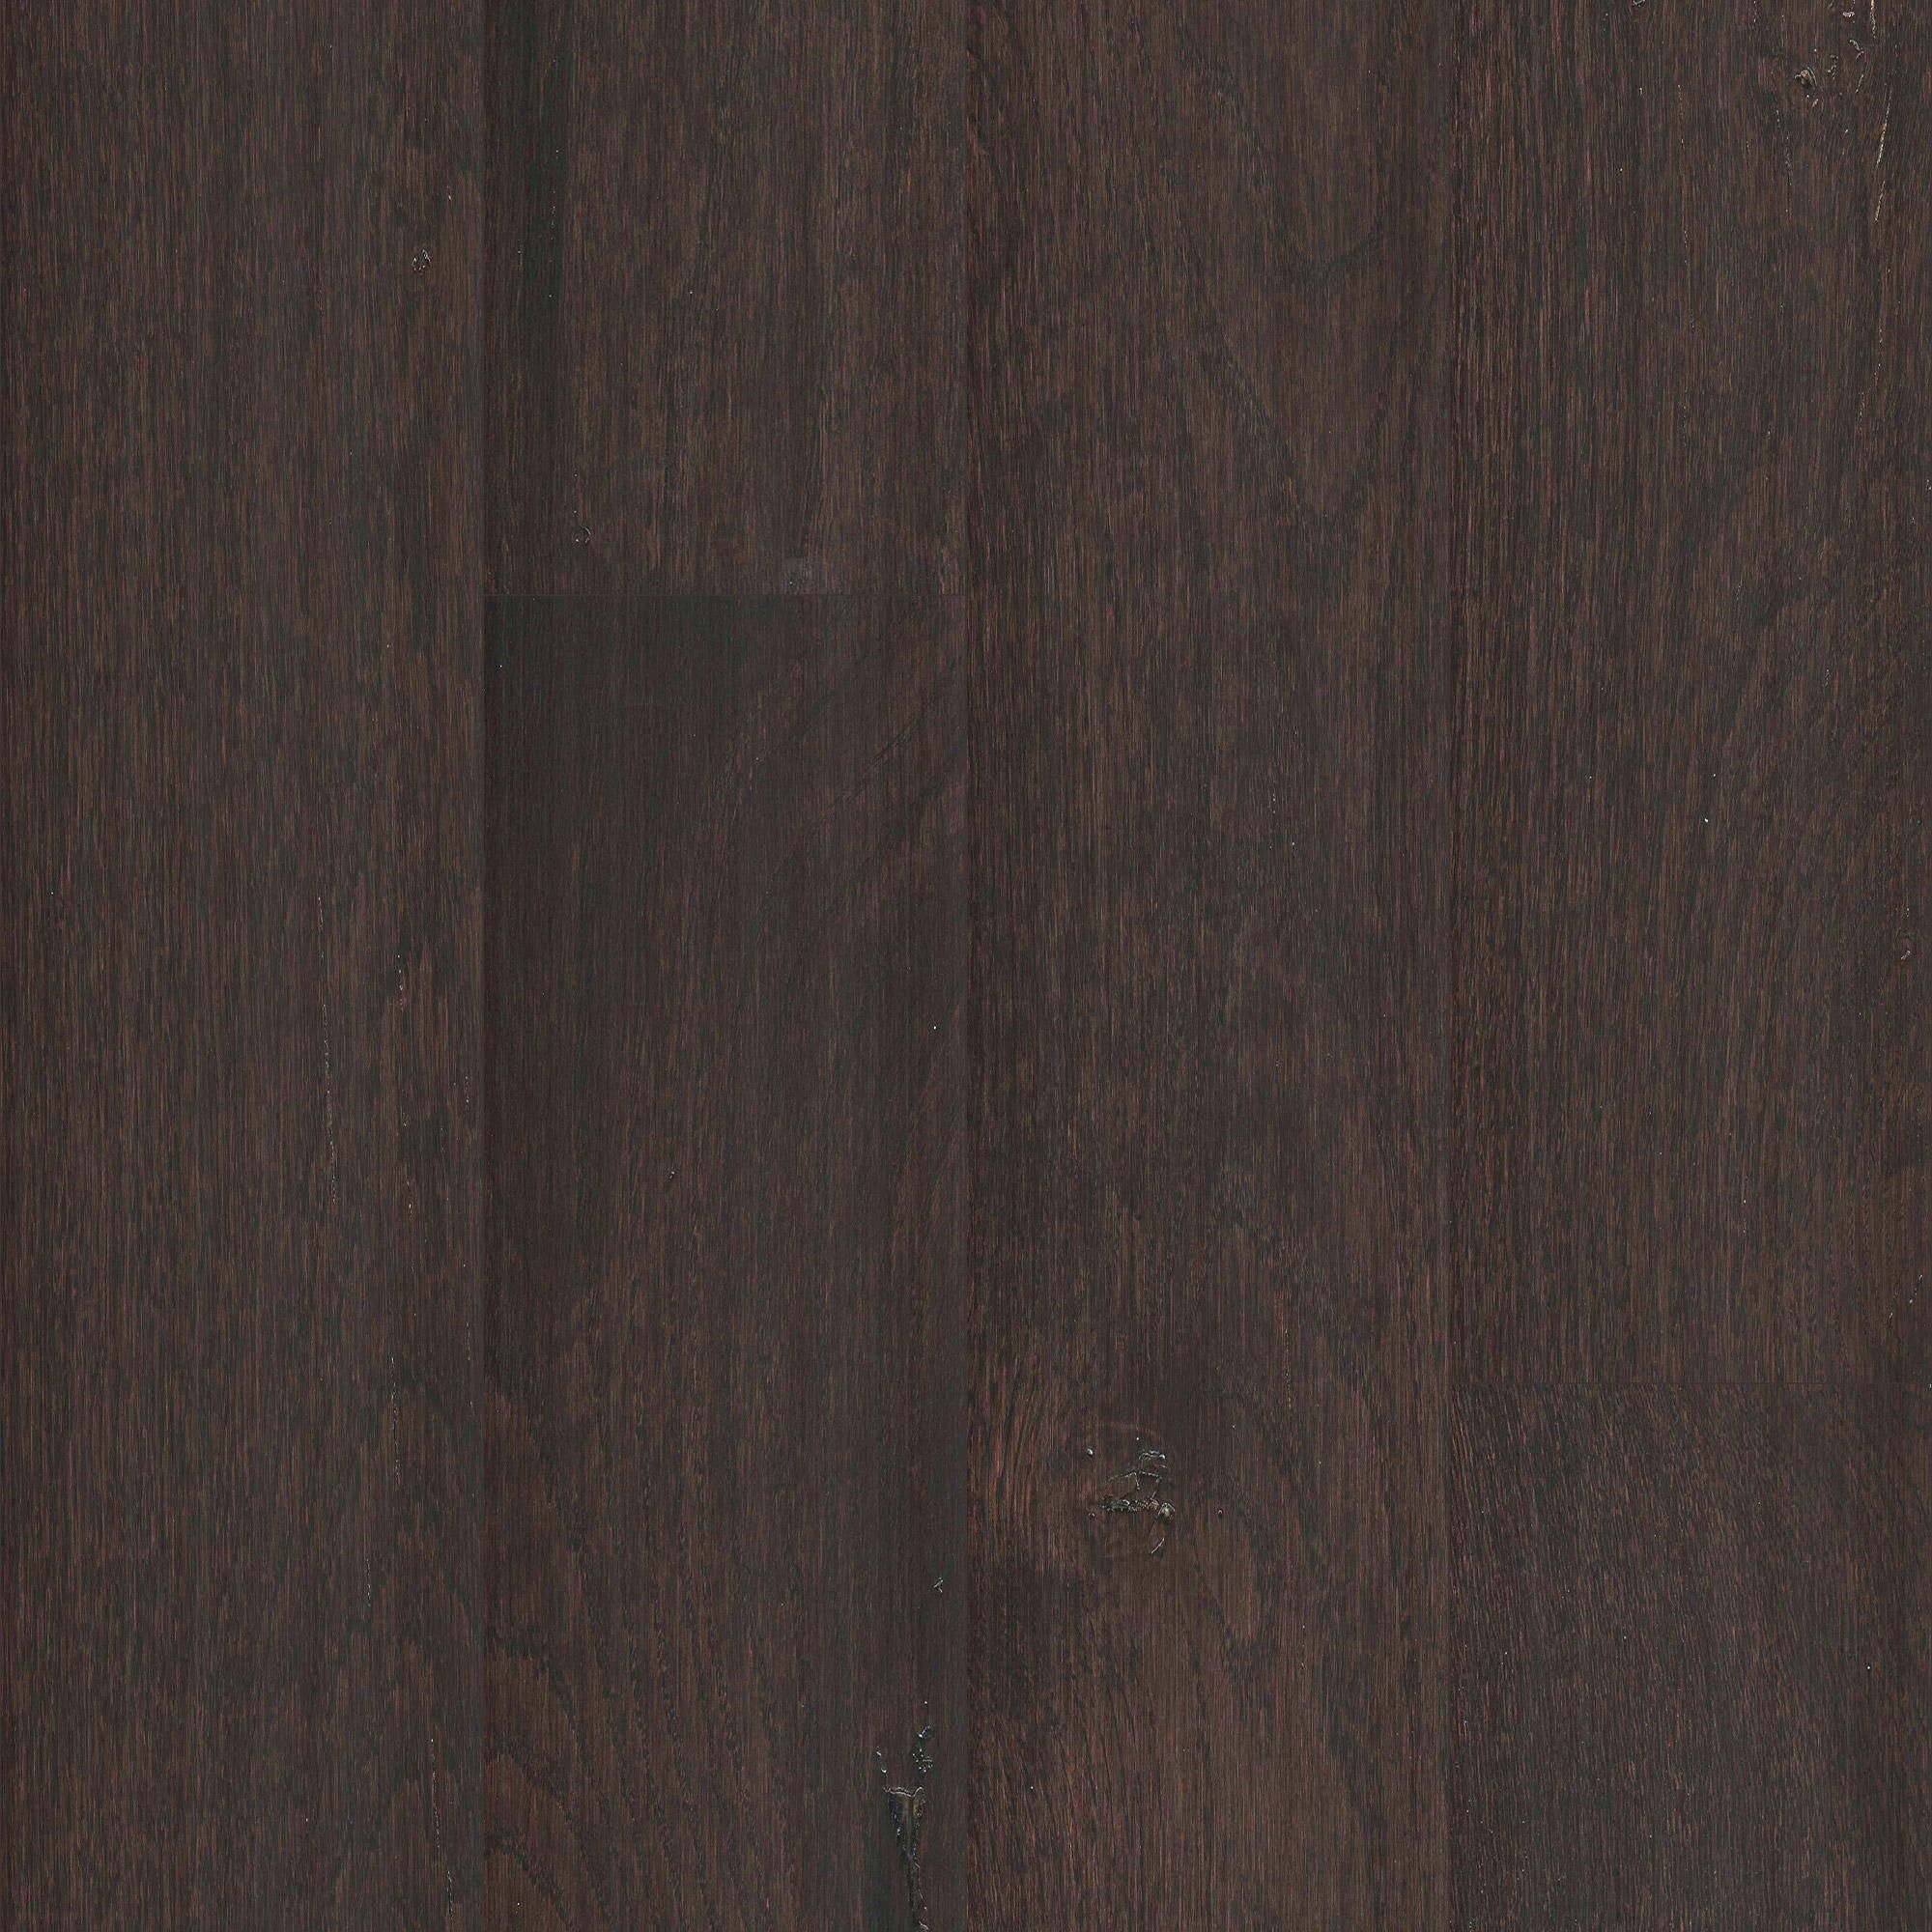 Mohawk Eastridge Oak Chocolate 3 4 Solid Hardwood 5 Wide Hardwood Flooring Natural Flooring Engineered Hardwood Flooring Flooring